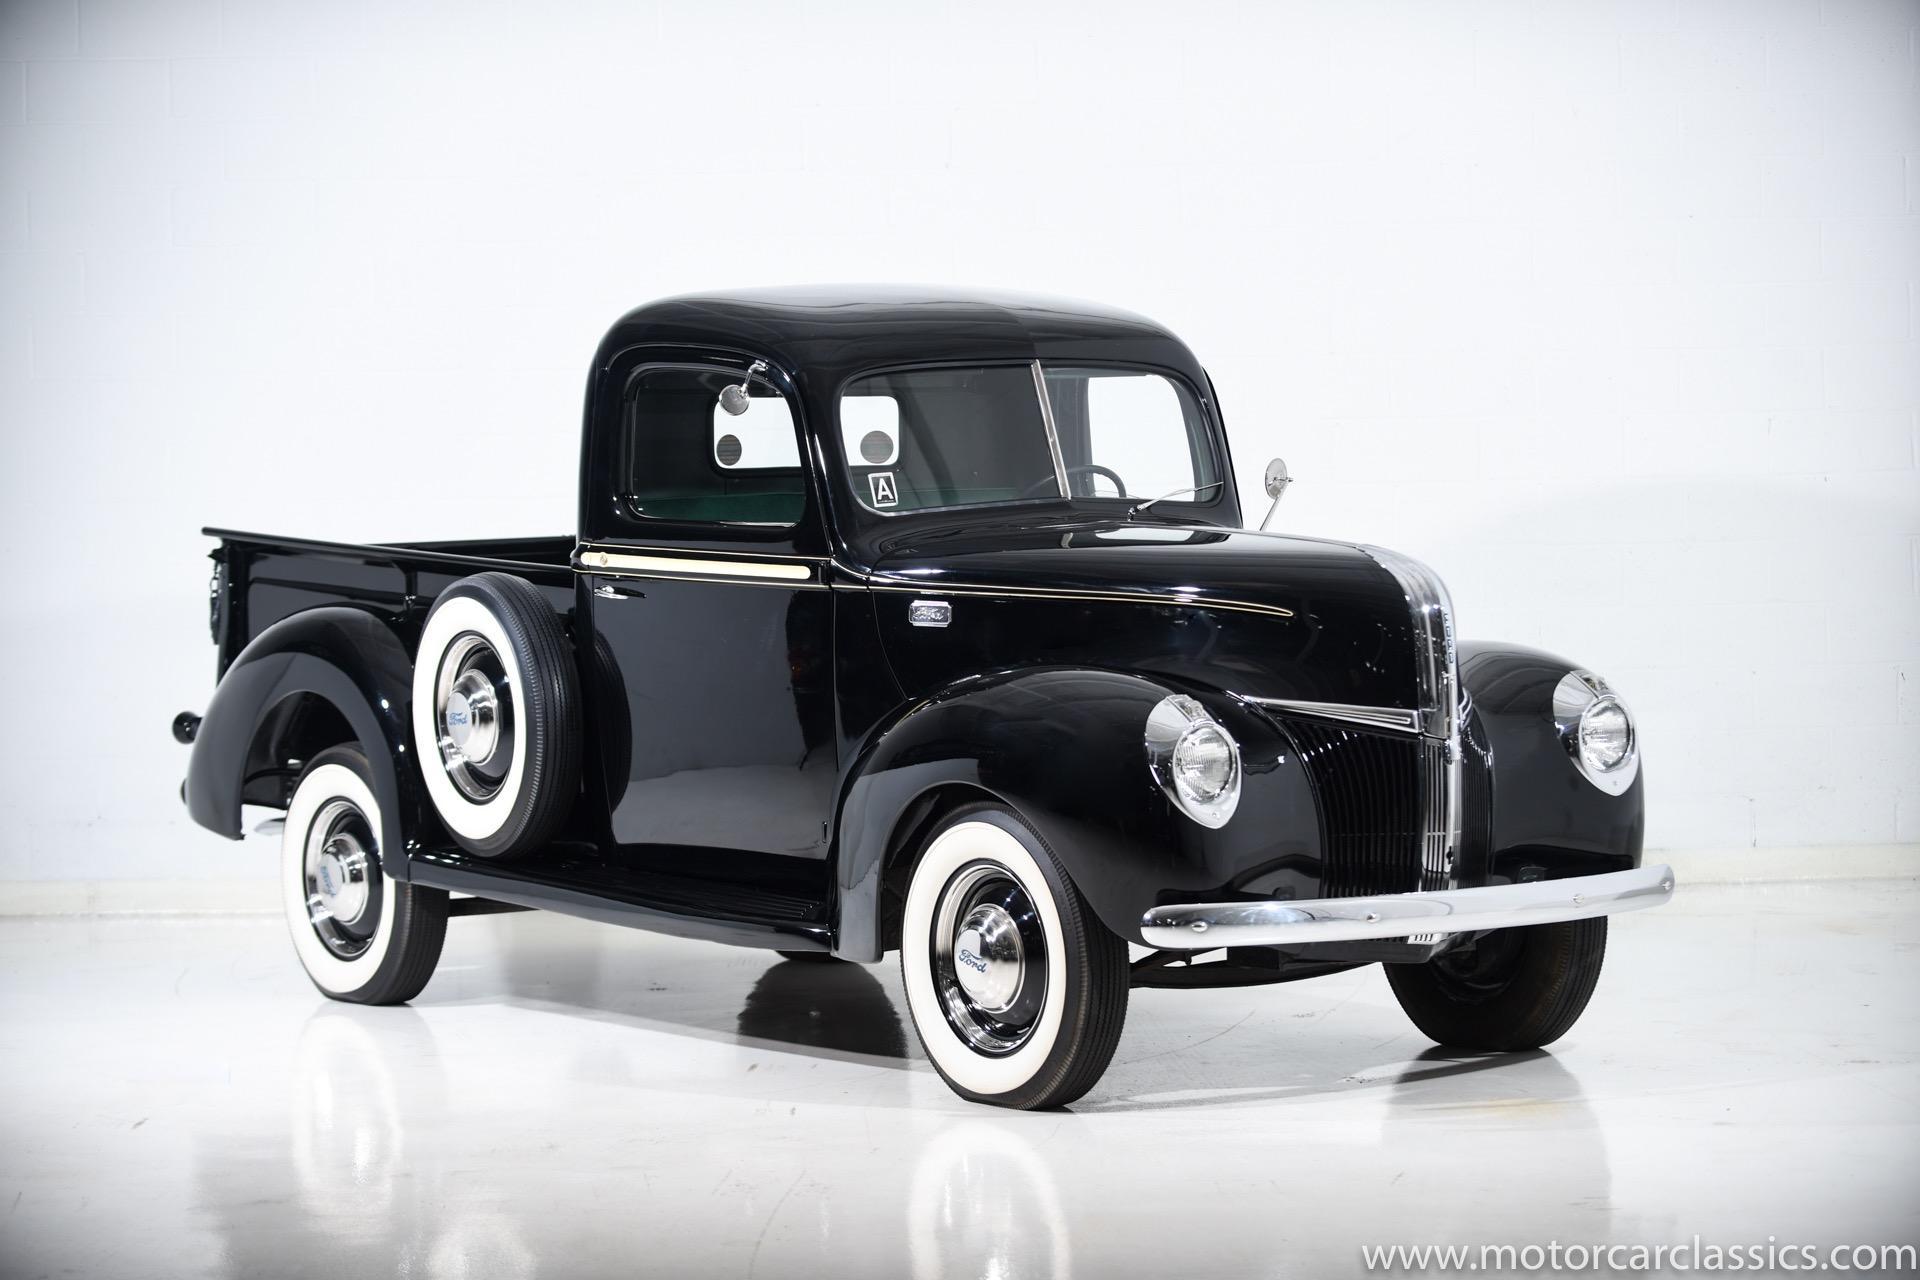 1941 Ford Pickup Motorcar Classics Exotic And Classic Car Truck Used Farmingdale Ny